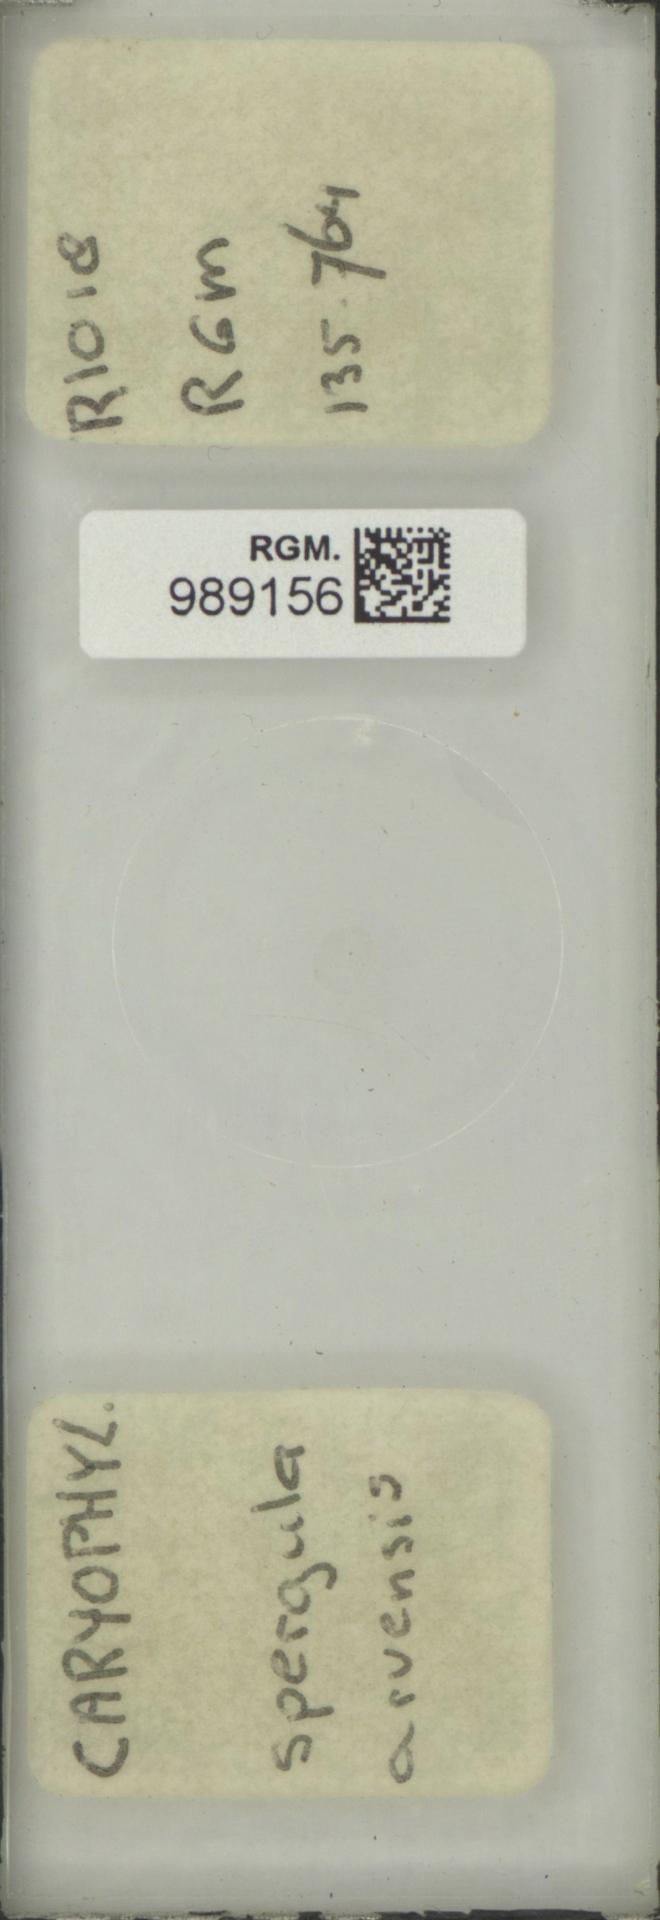 RGM.989156 | Spergula arvensis